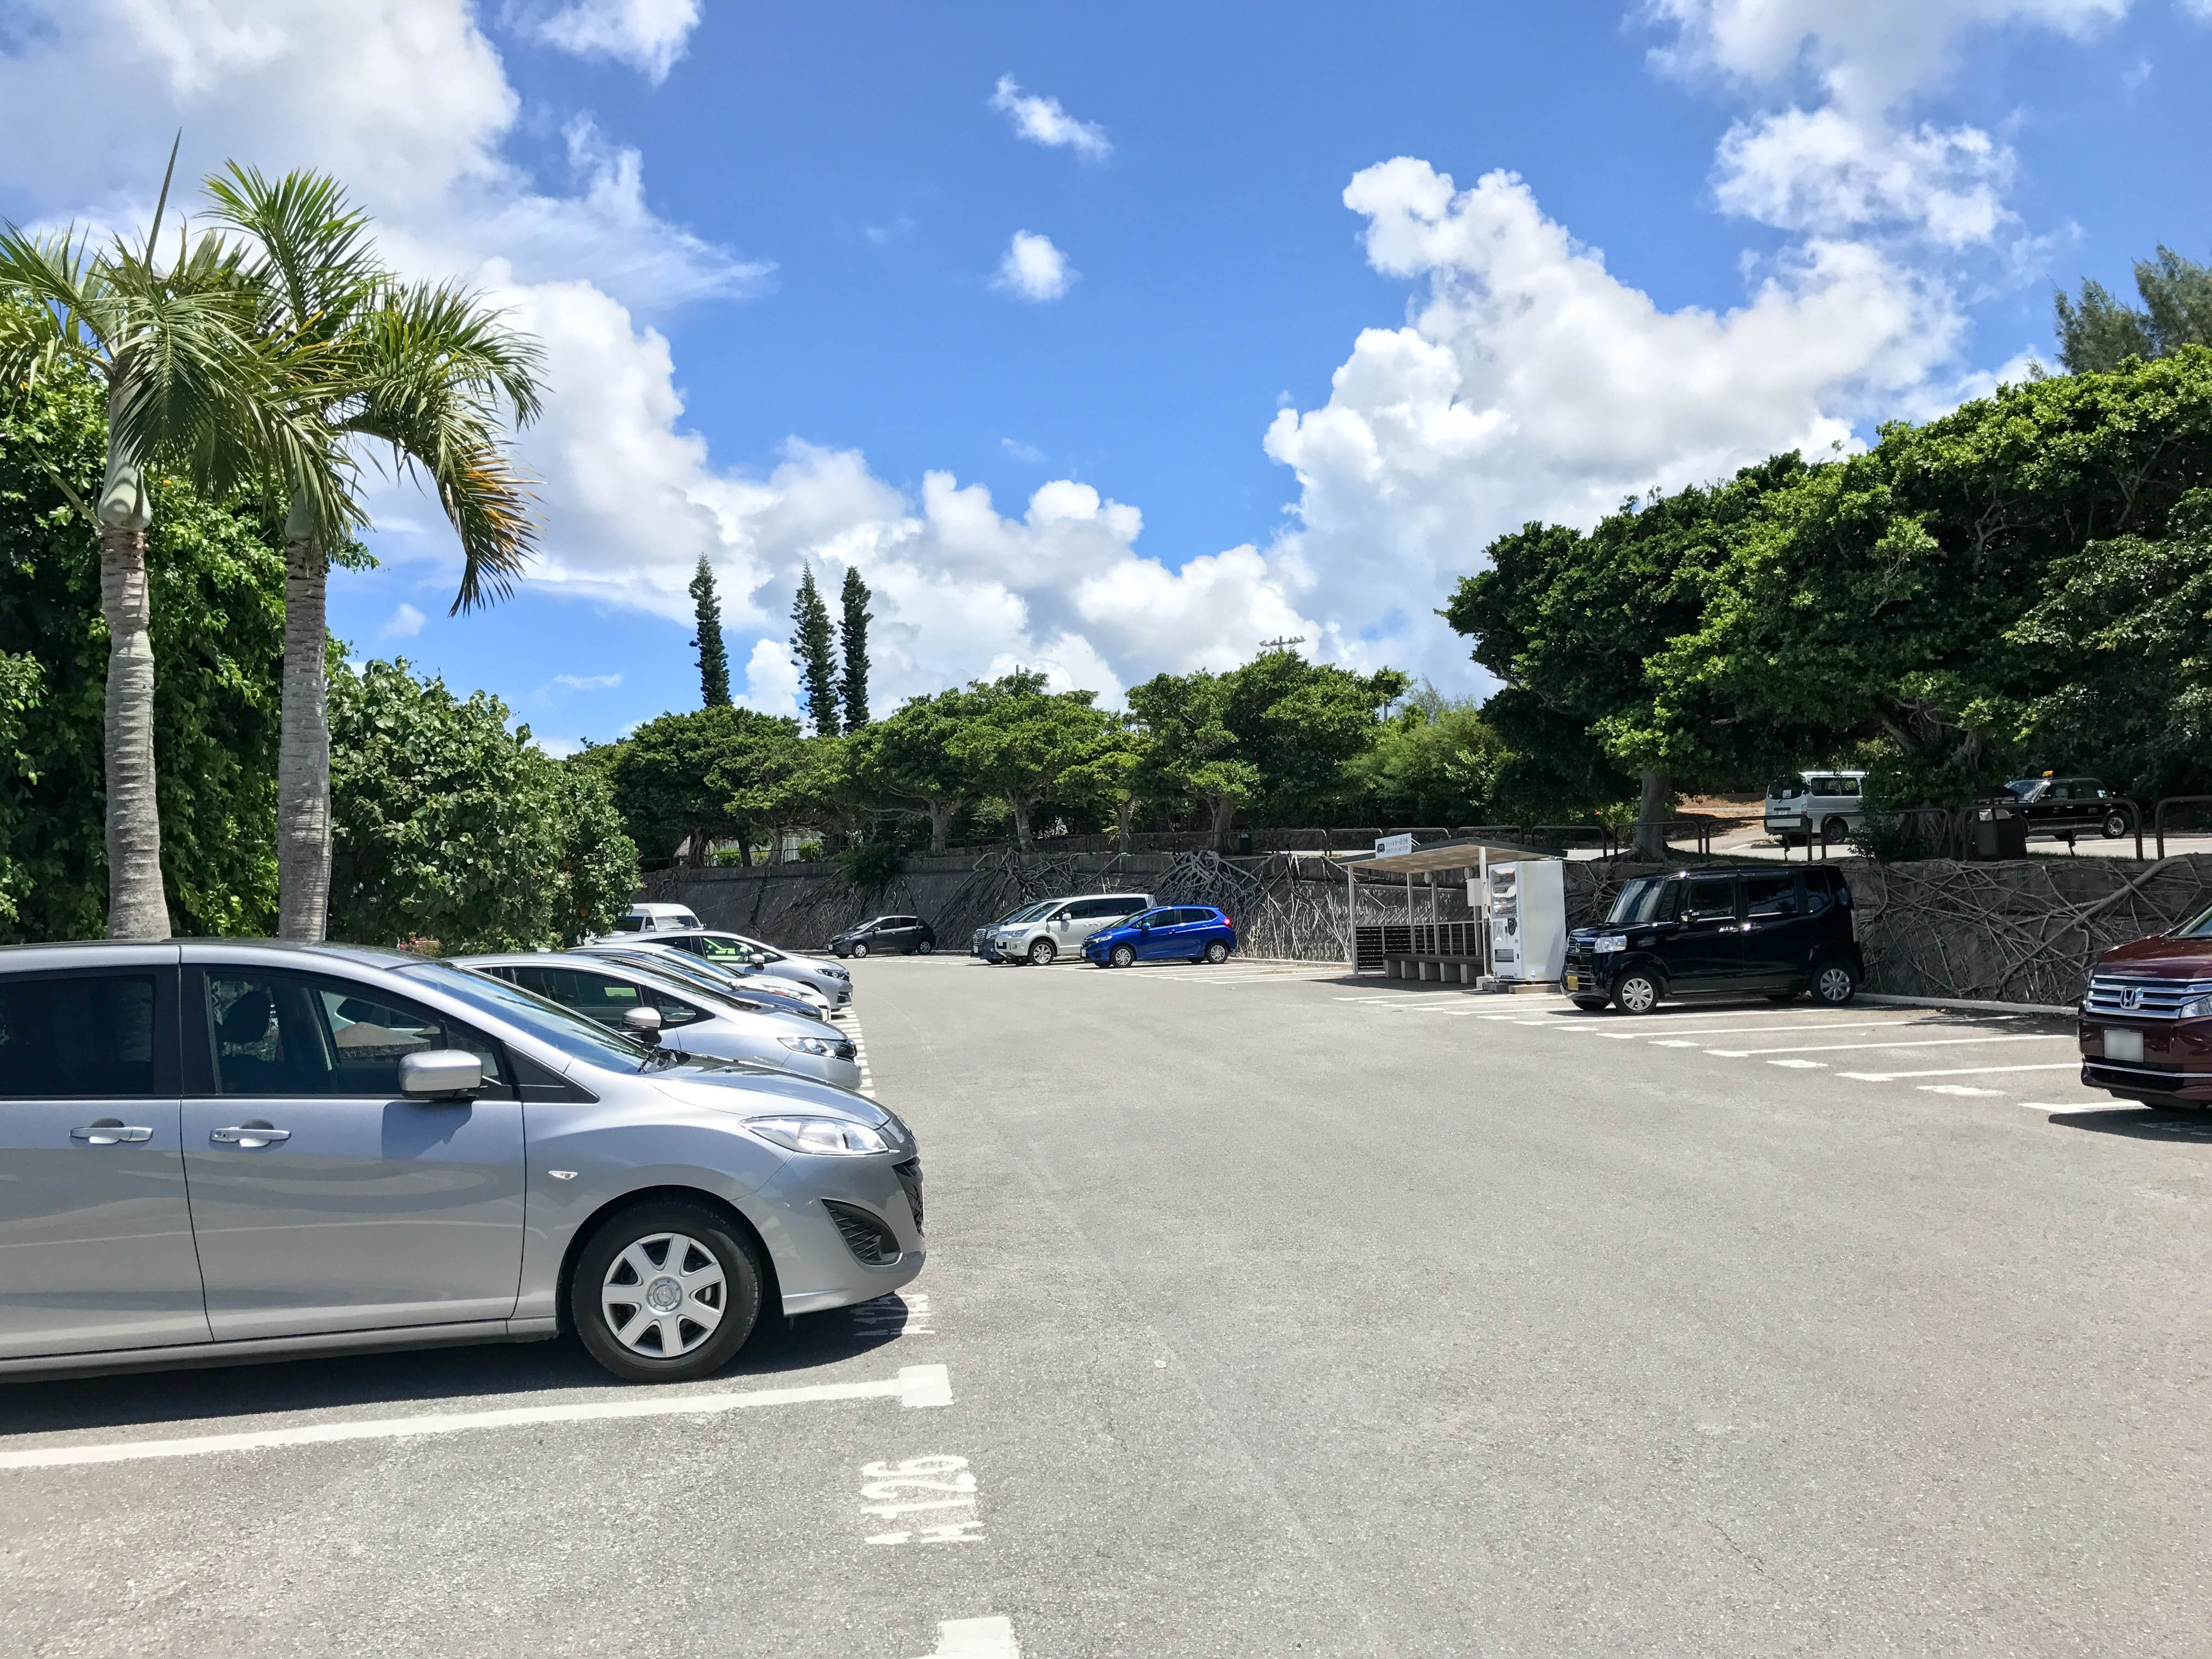 ANAインターコンチネンタル万座ビーチリゾートの駐車場